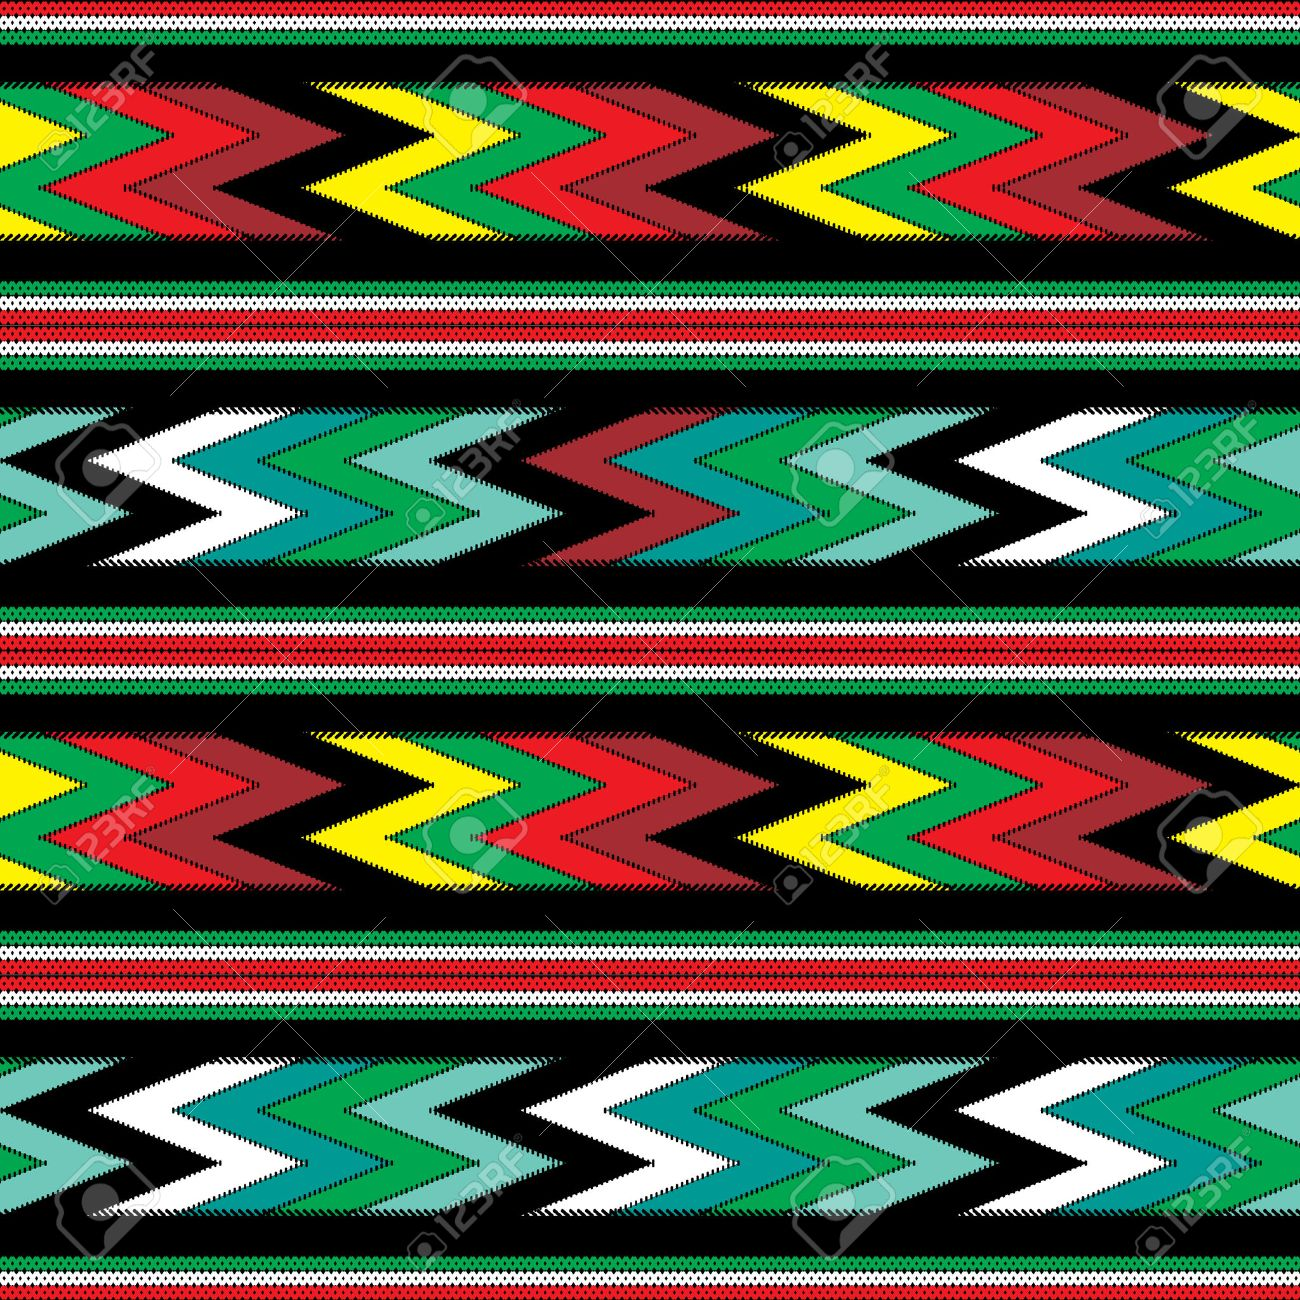 https://previews.123rf.com/images/nkuchumova/nkuchumova0902/nkuchumova090200020/4311404-seamless-colorful-mexican-fabric-pattern.jpg